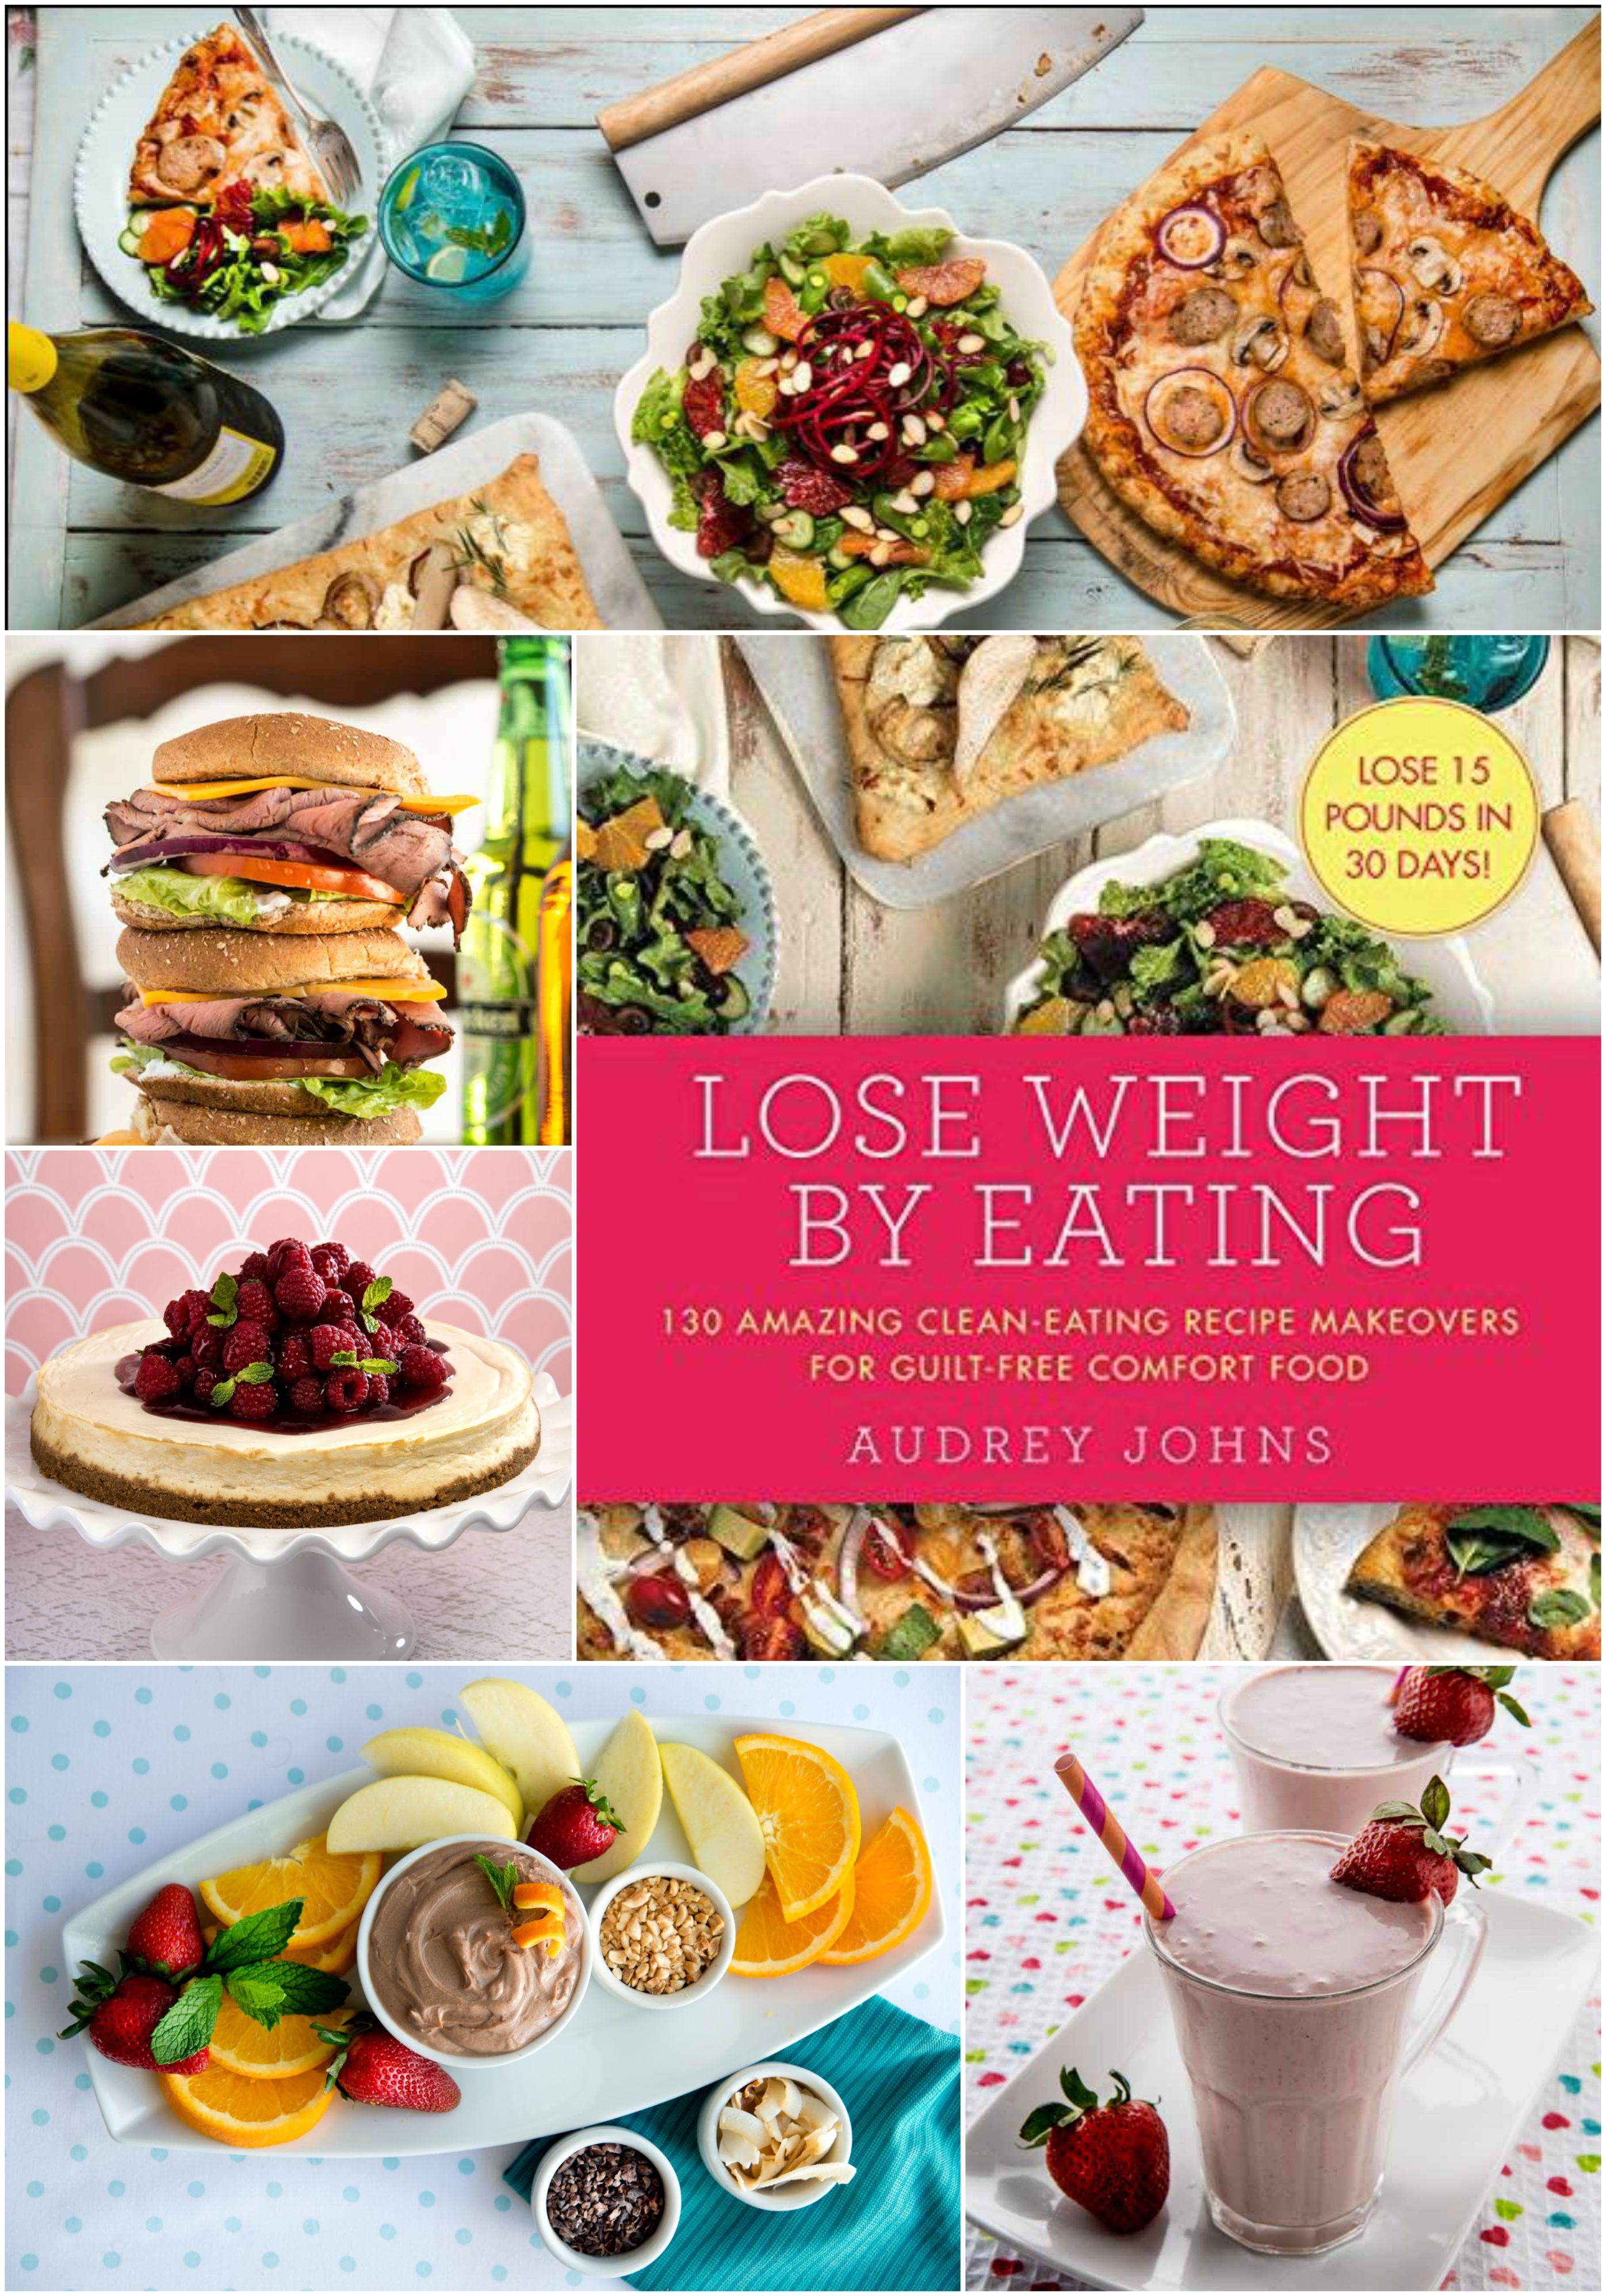 Audrey Johns' Clean Eating Cookbook